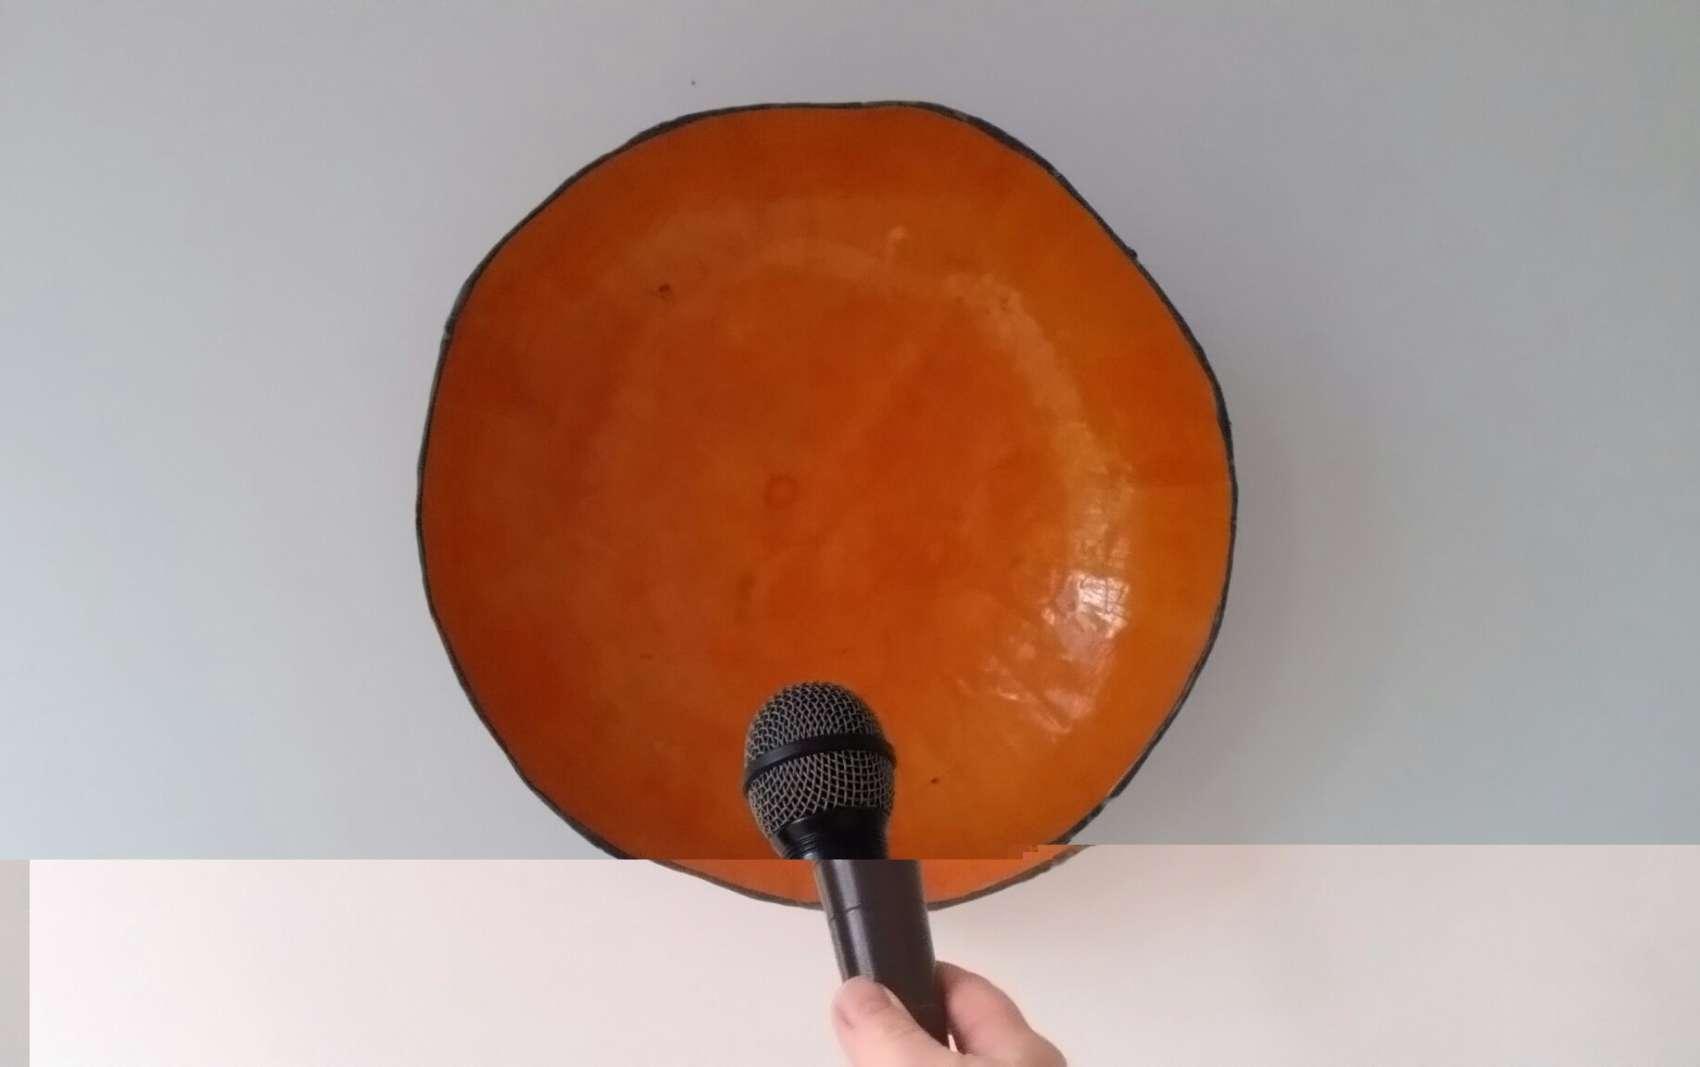 Orange bowl and microphone